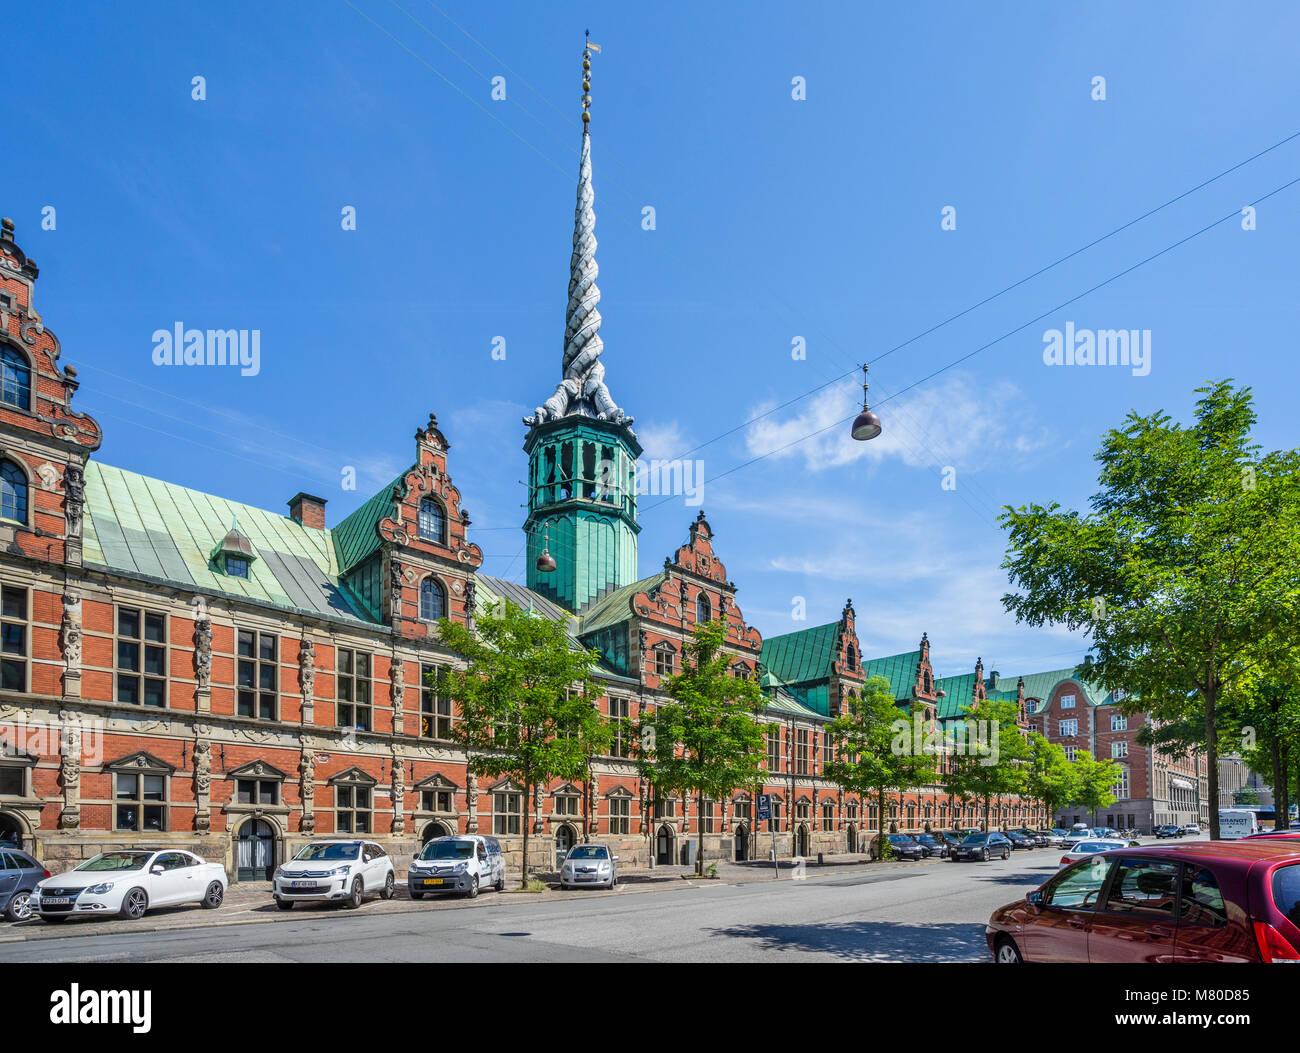 Denmark, Zealand, Copenhagen, view of the Børsen, Royal exchange, the former stock exchange with its distinctive - Stock Image